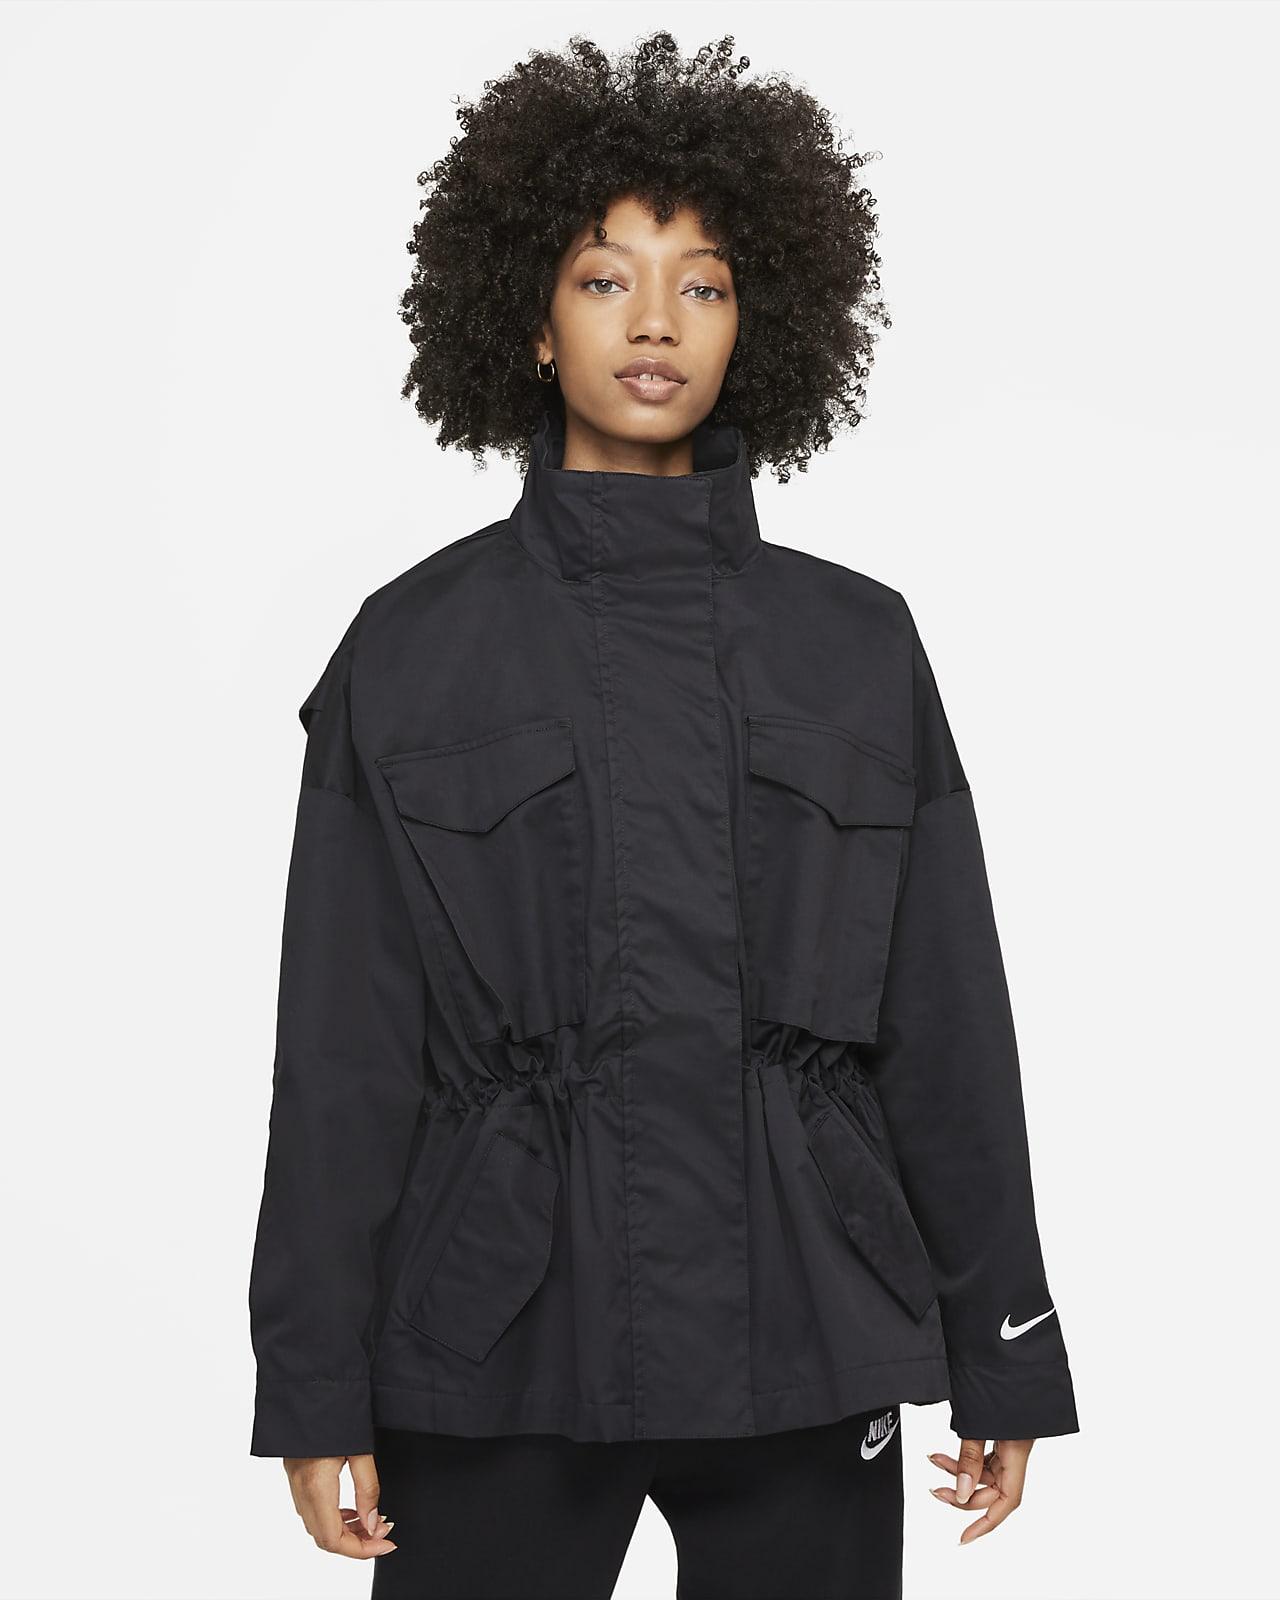 Nike Sportswear Collection Essentials M65 Kadın Ceketi